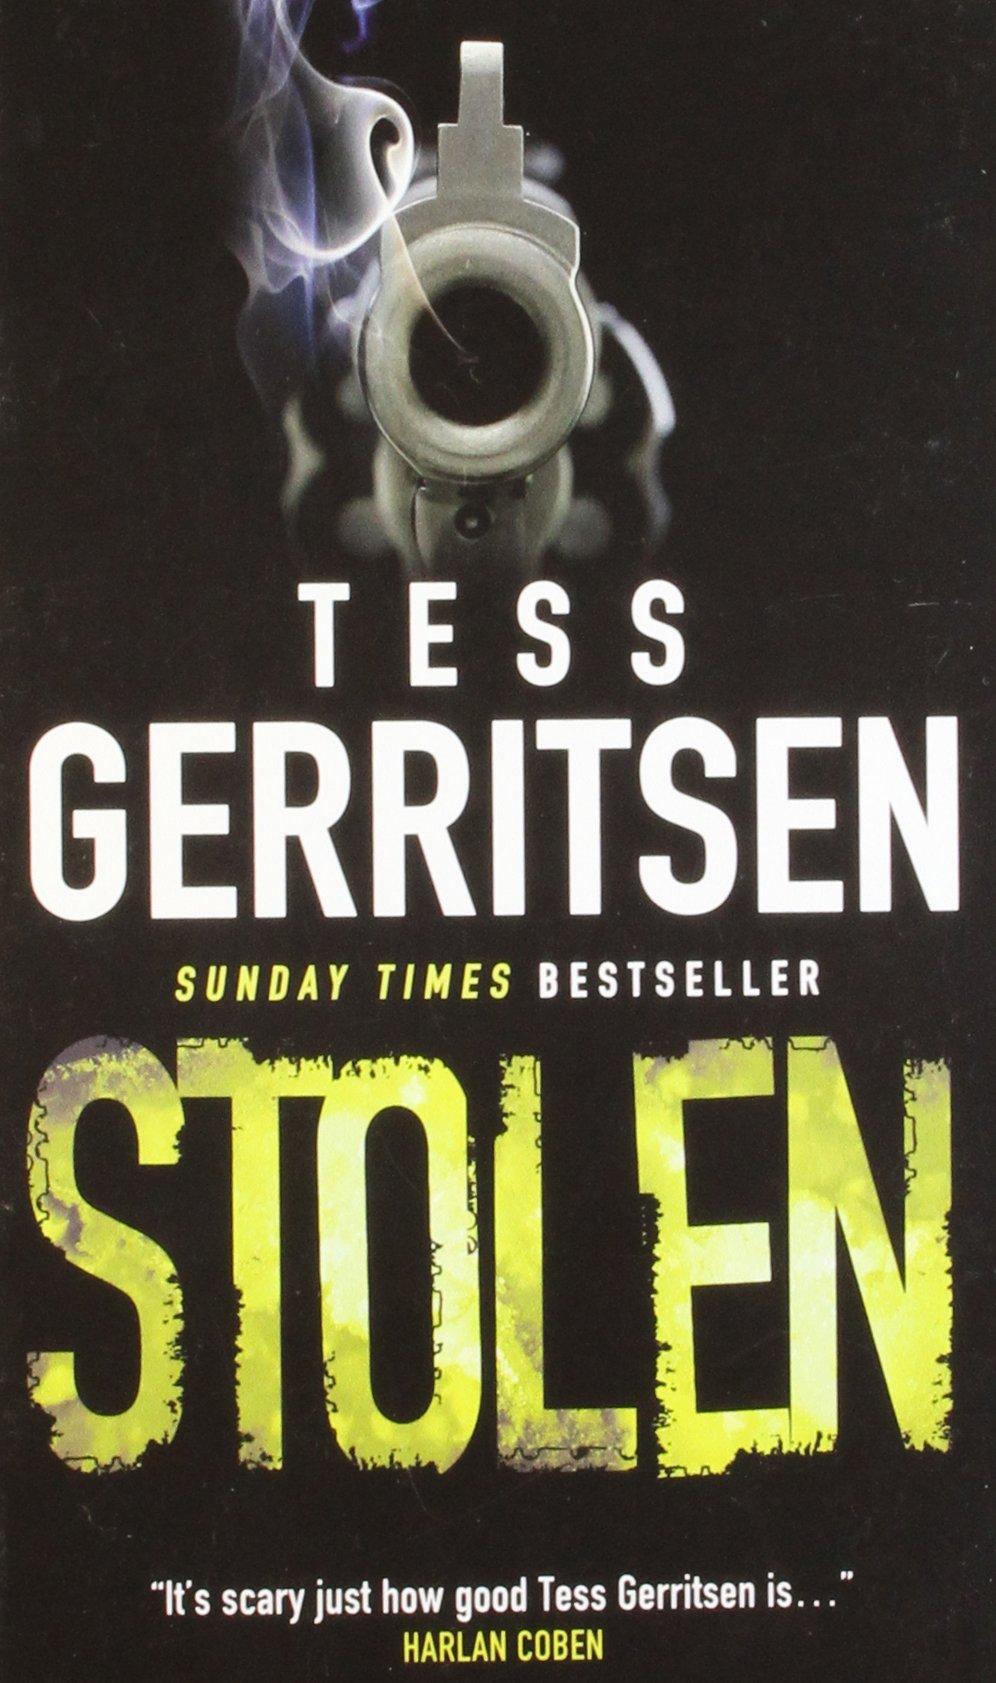 Stolen (Thief Of Hearts): Tess Gerritsen: 9780778301950: Amazon.com: Books